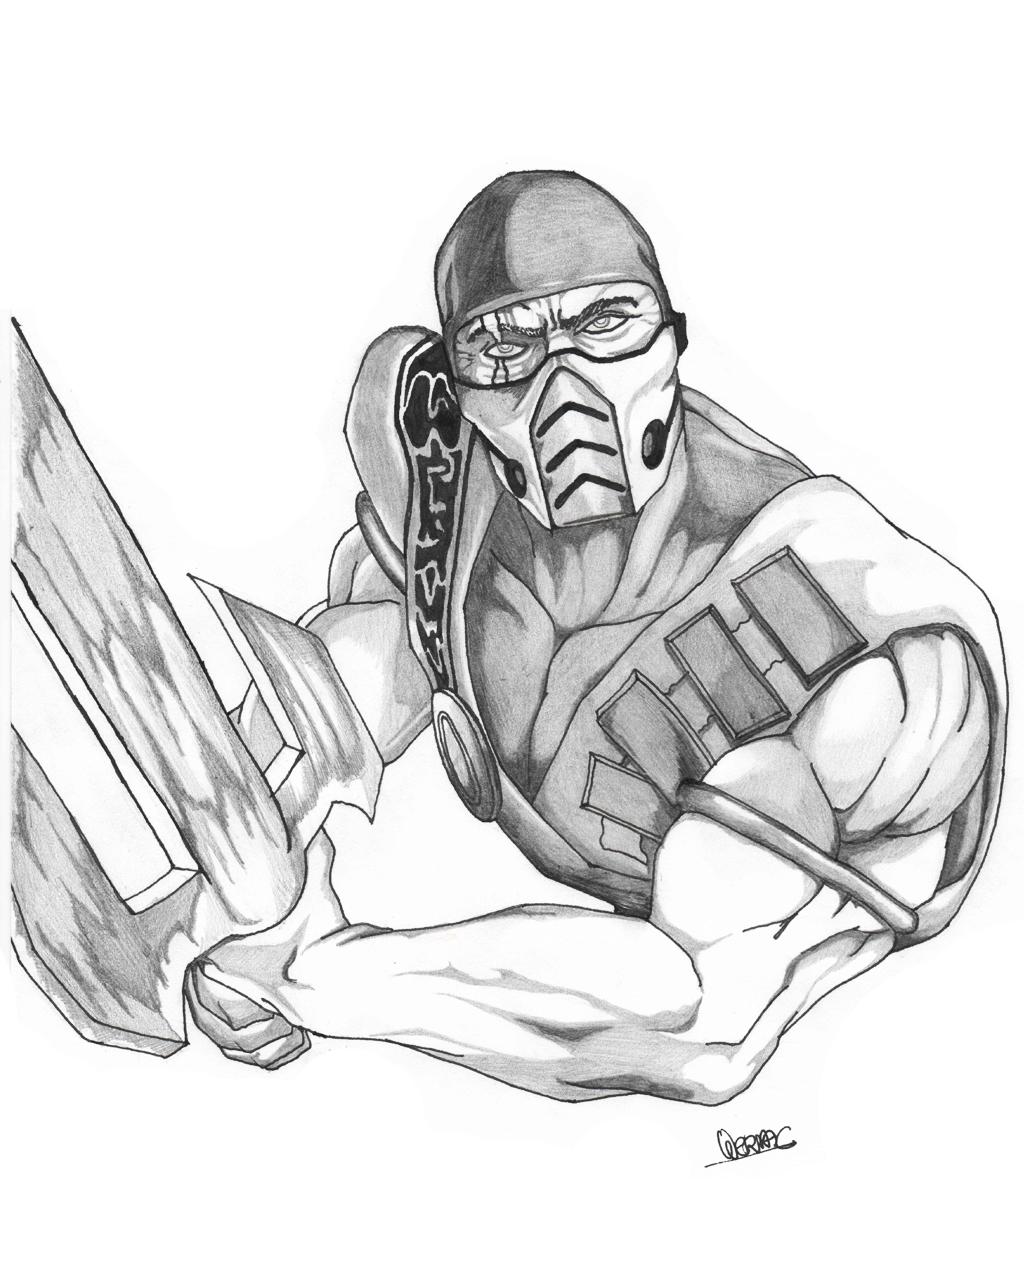 Sub-Zero - Mortal Kombat by WermaC on DeviantArt